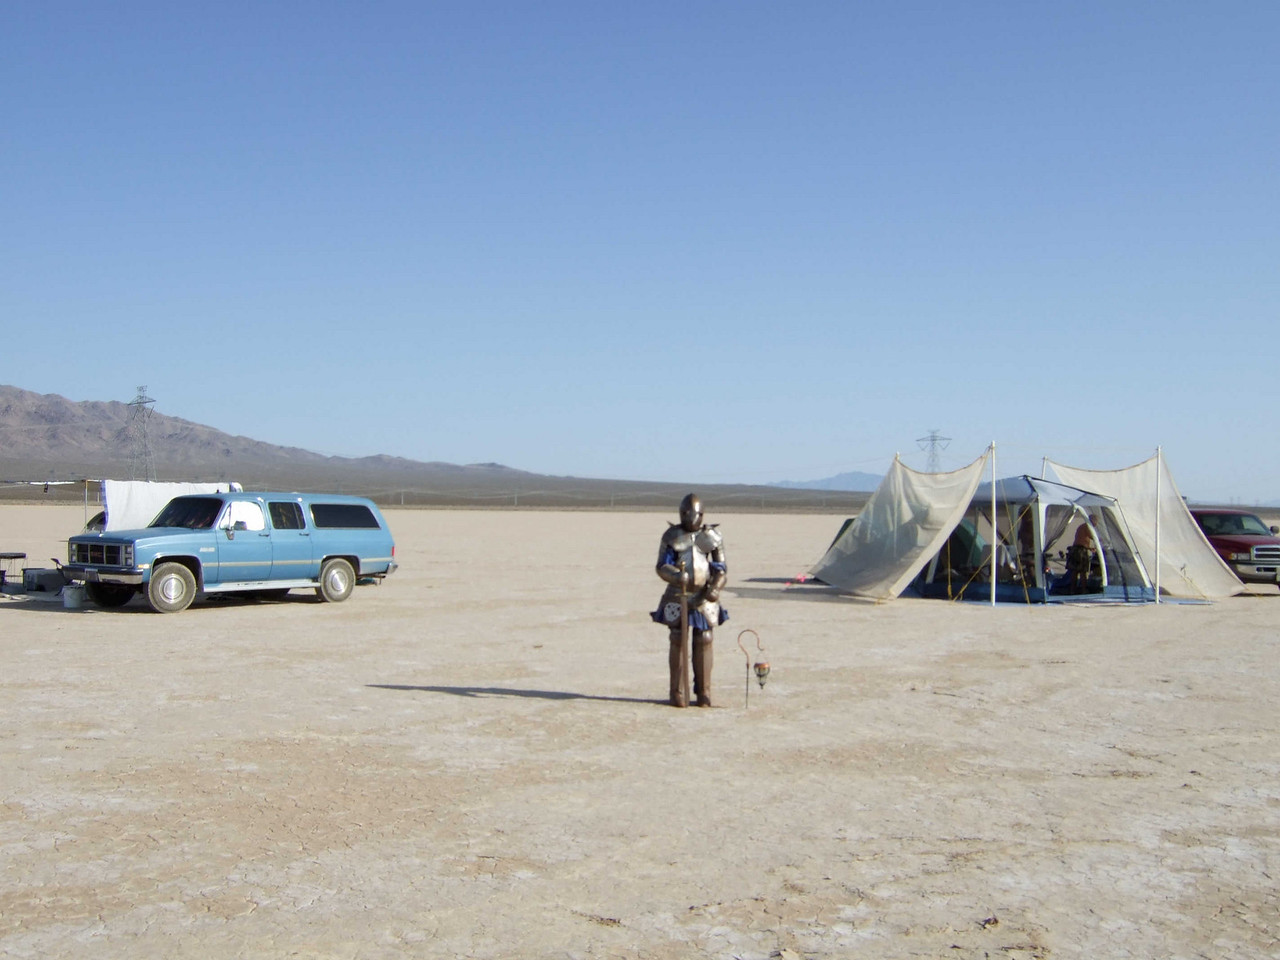 We camped near a knight in dusty armor.